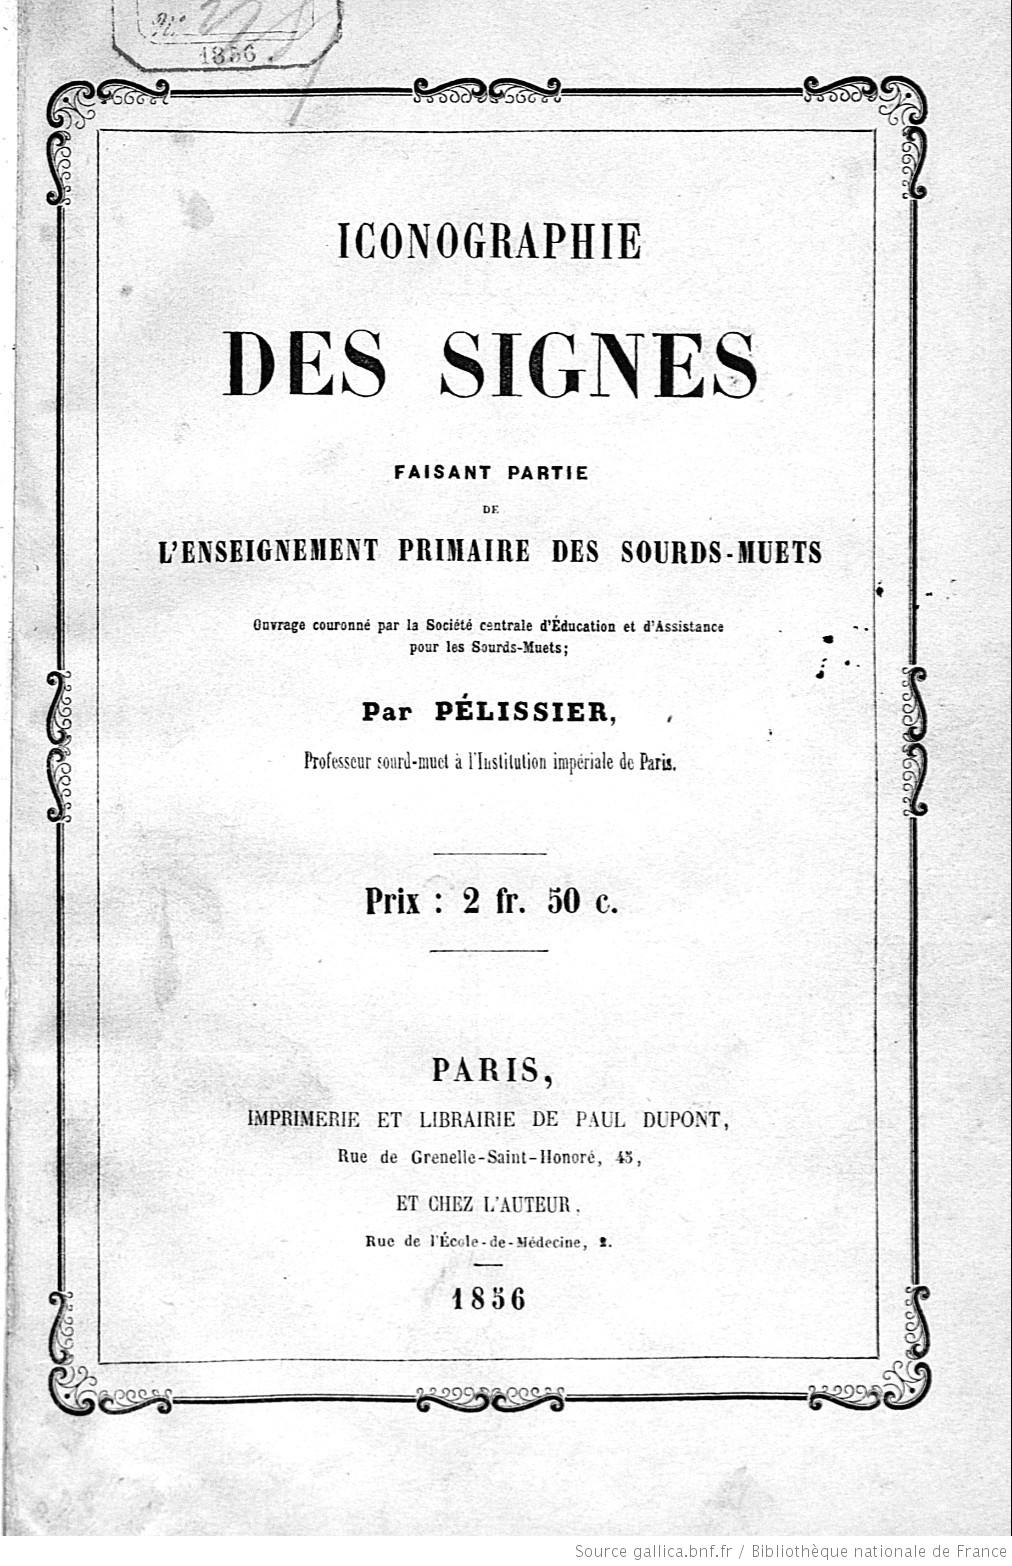 1856: Publication of Iconography des Signes, by Pélissier